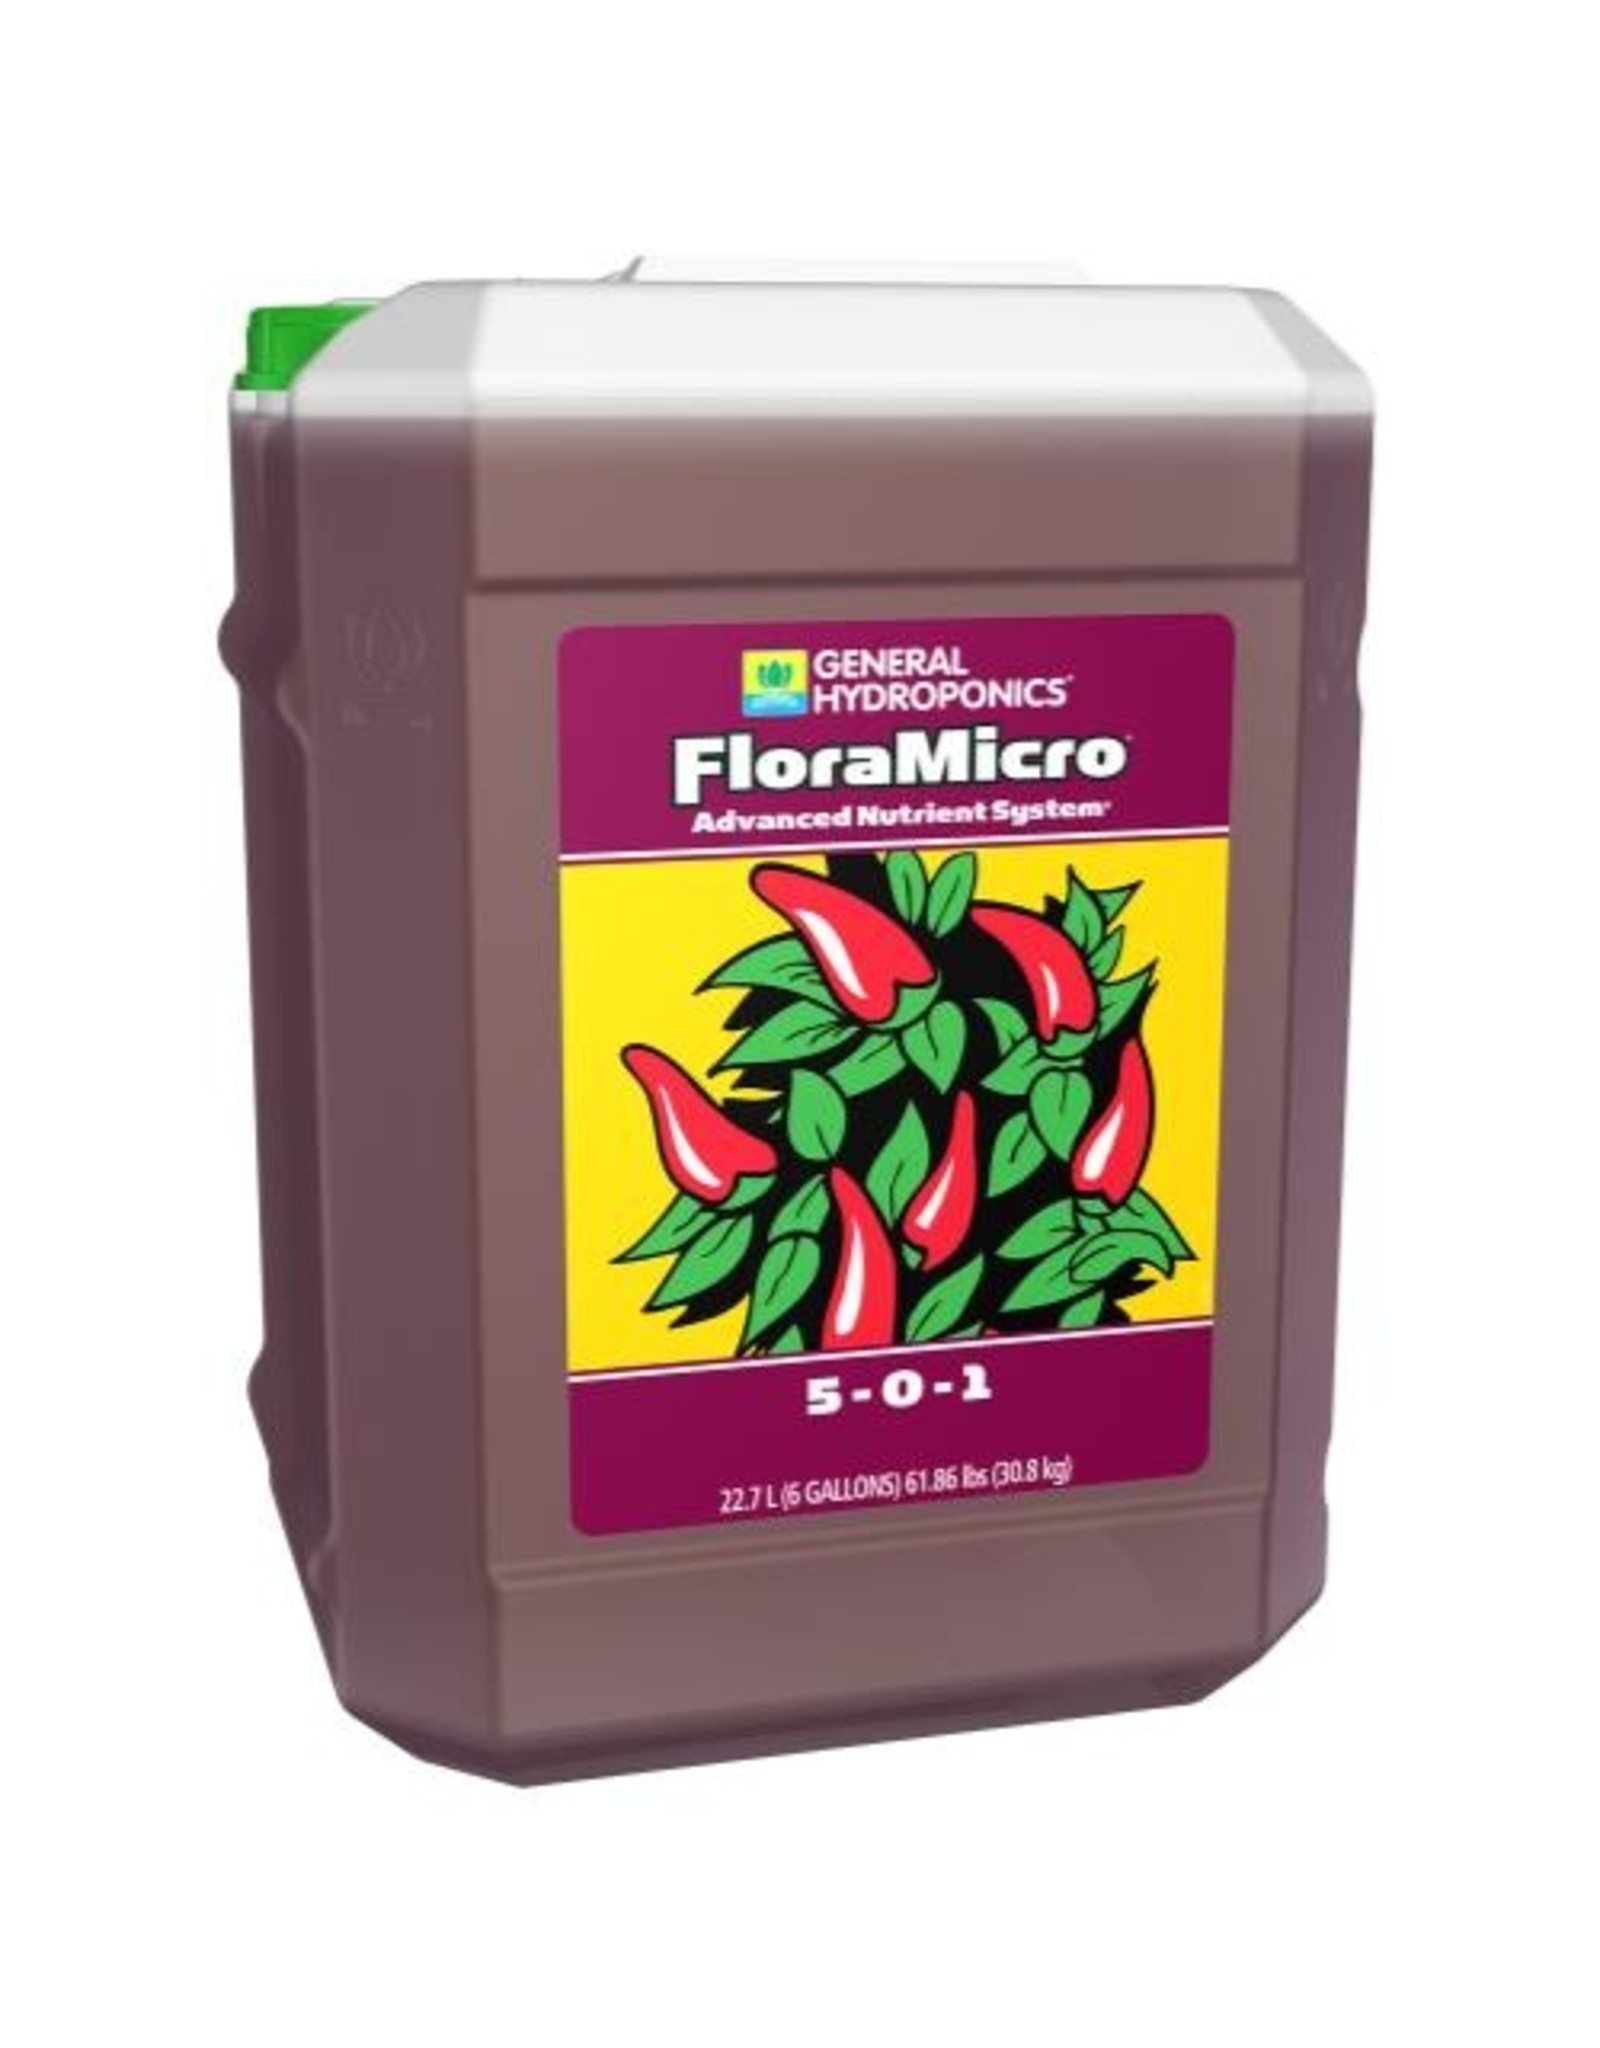 General Hydroponics GH Floramicro - 6 gal